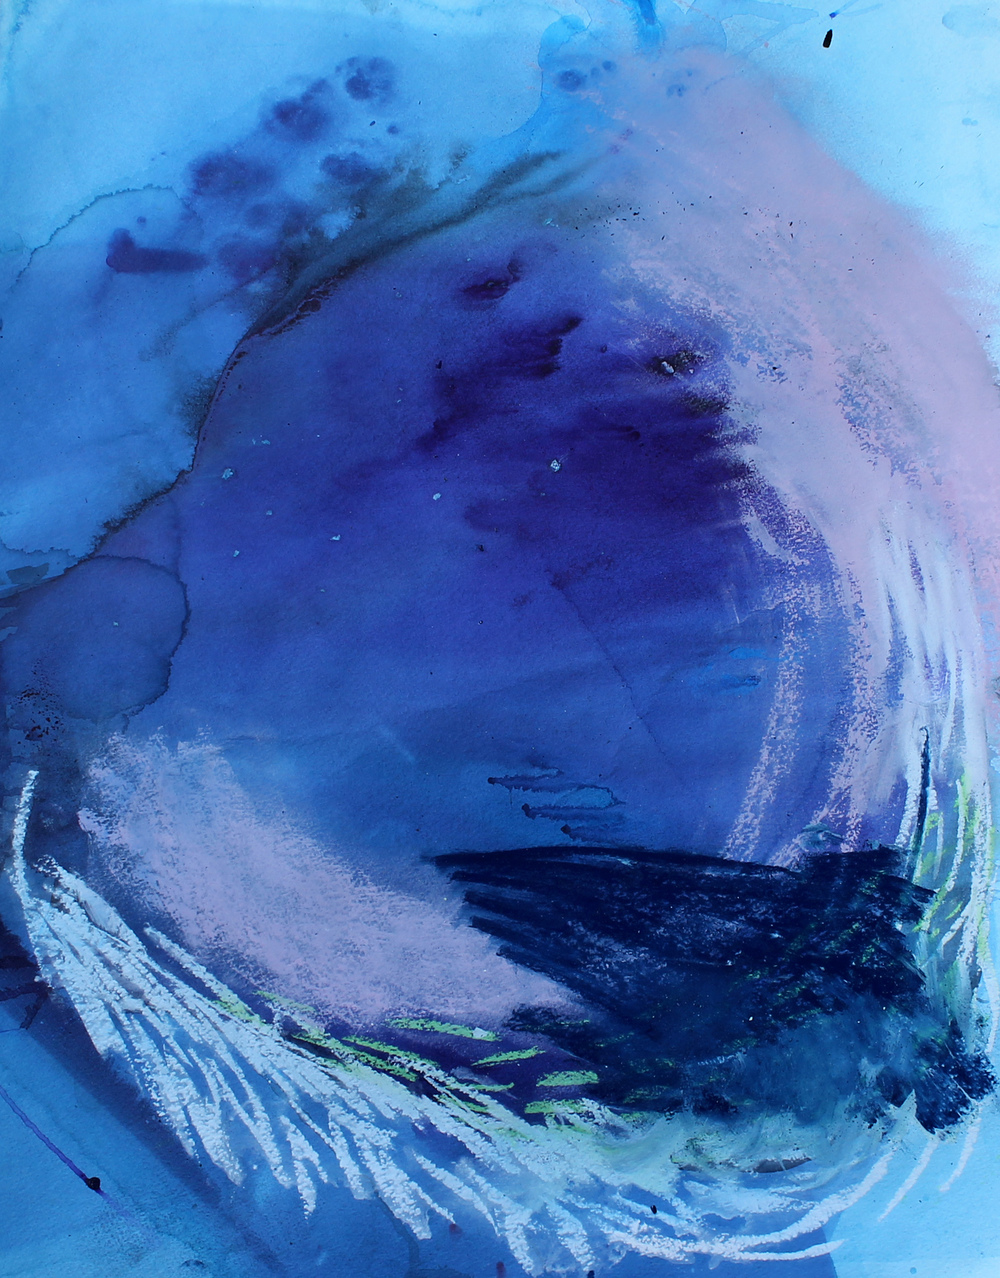 blue eyed water drop.jpg